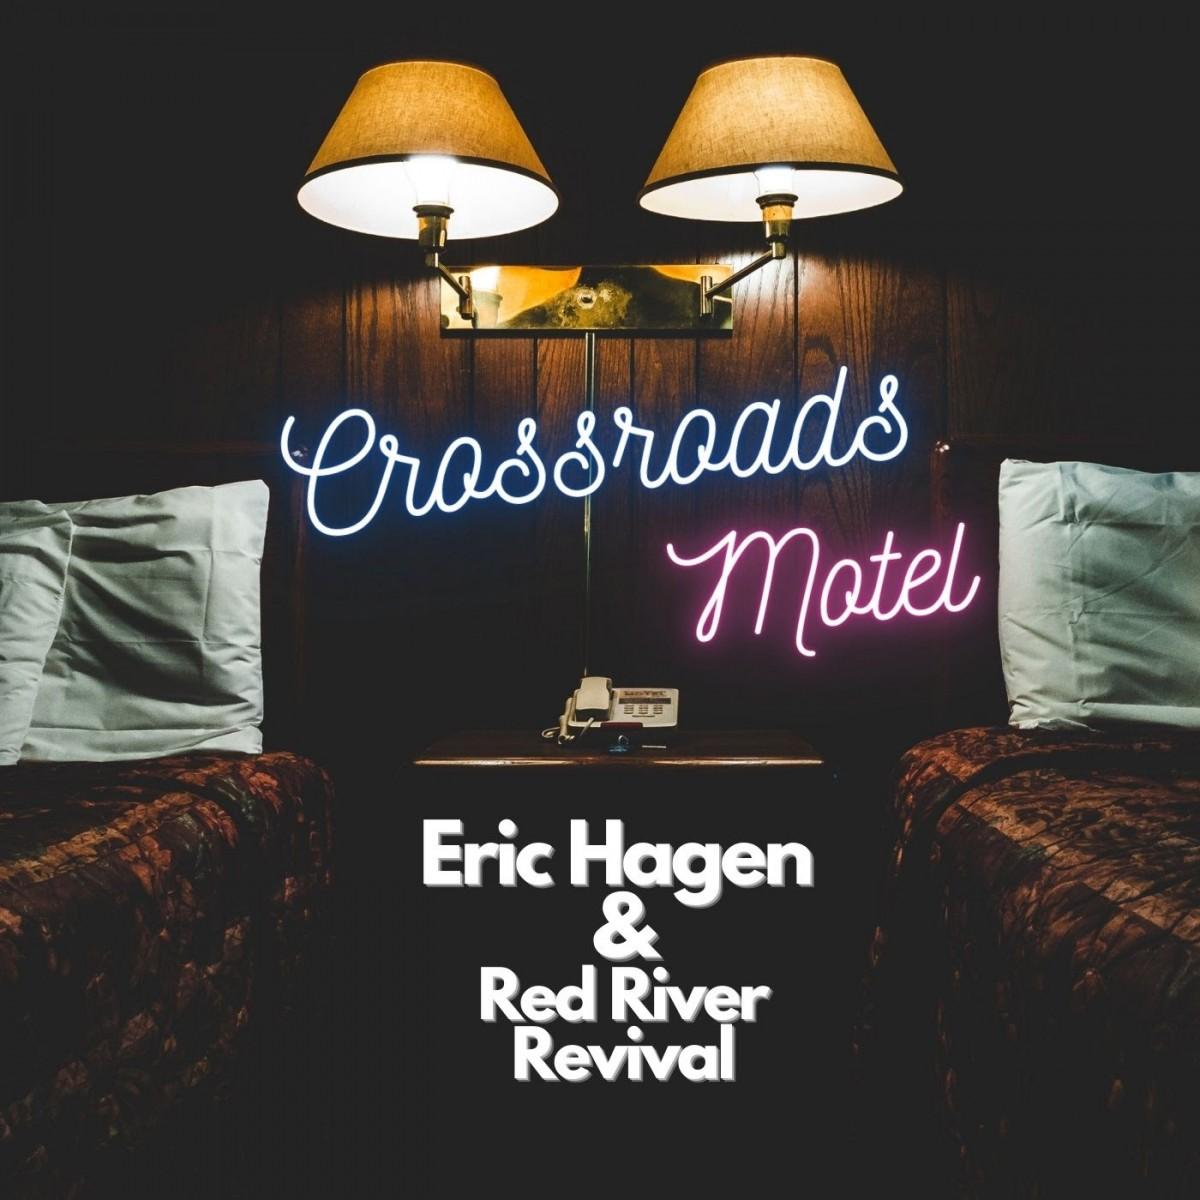 Eric Hagen & Red River Revival - Crossroads Motel